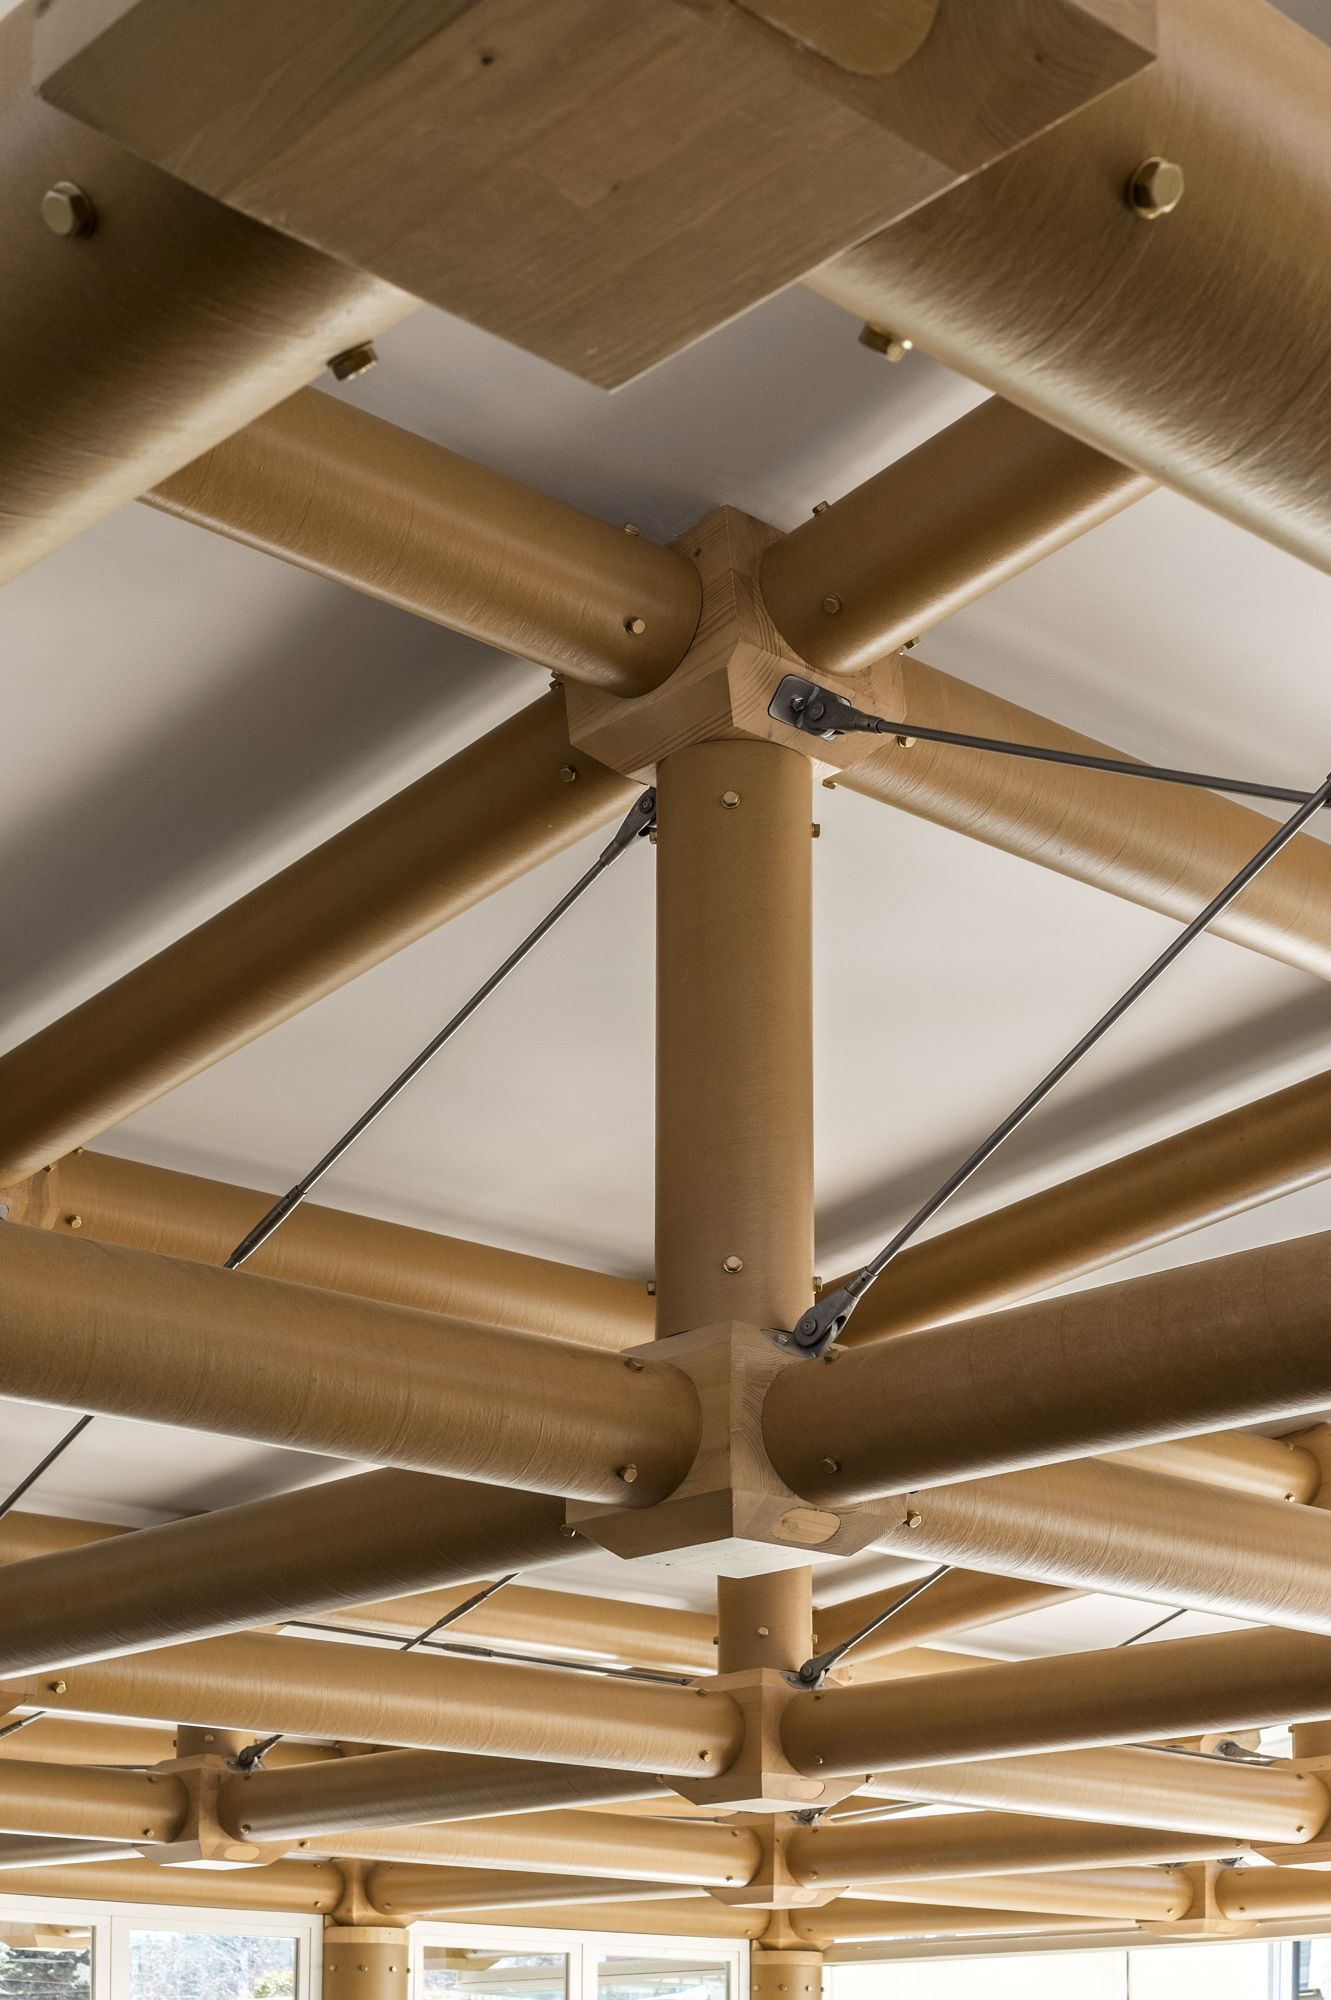 paper pavilion ie business school madrid espa a 2013 shigeru ban madera pinterest. Black Bedroom Furniture Sets. Home Design Ideas